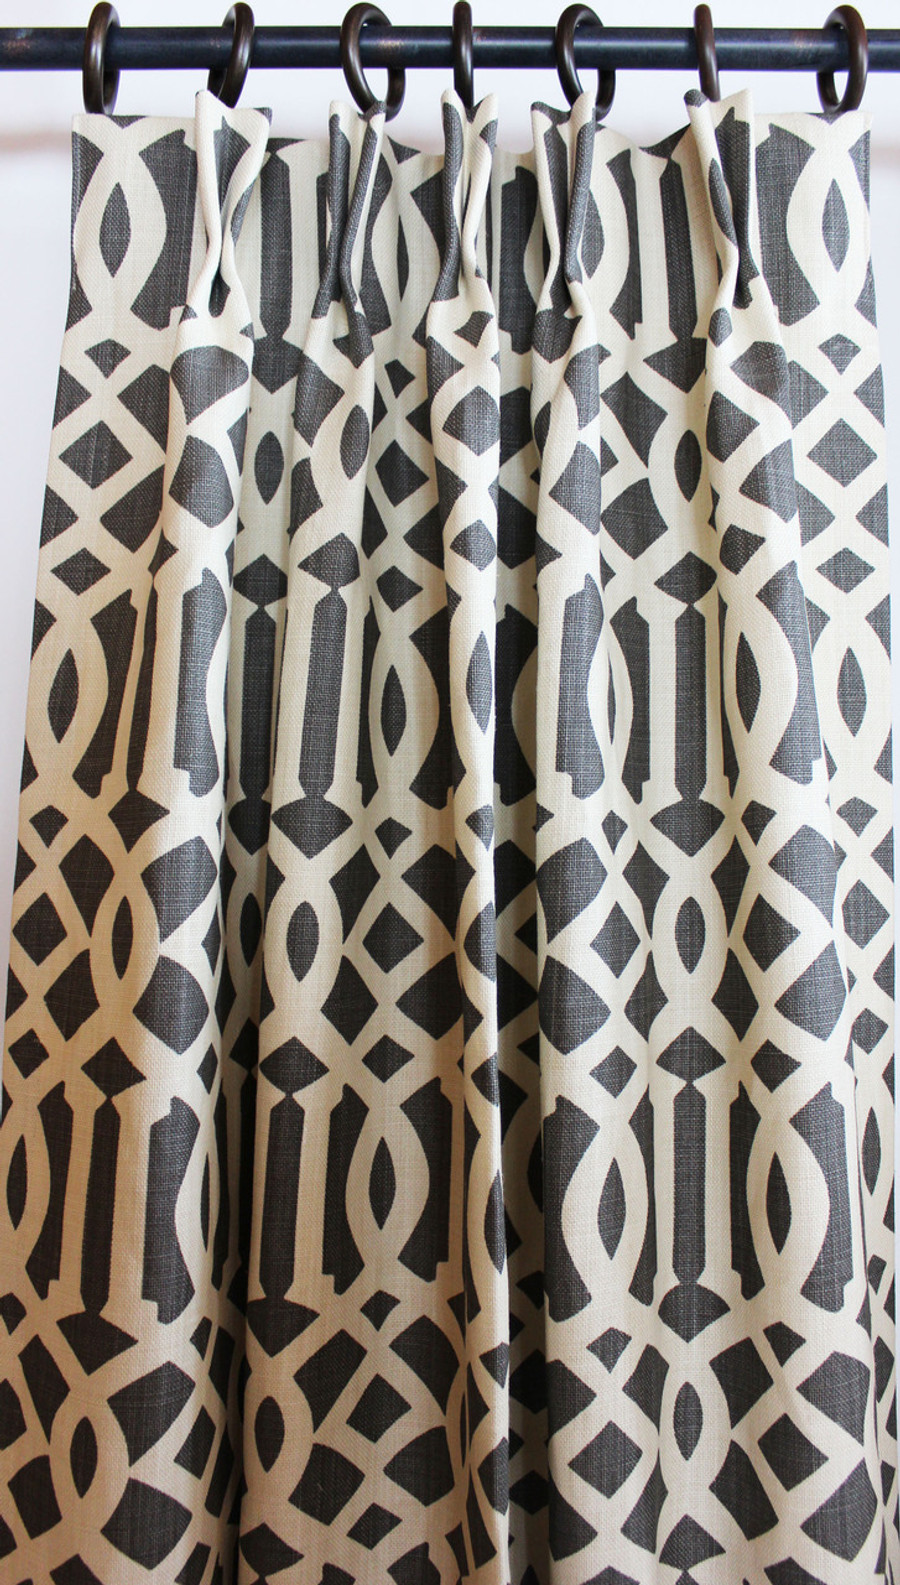 Custom Pleated Drapes by Lynn Chalk in Imperial Trellis in Midnight